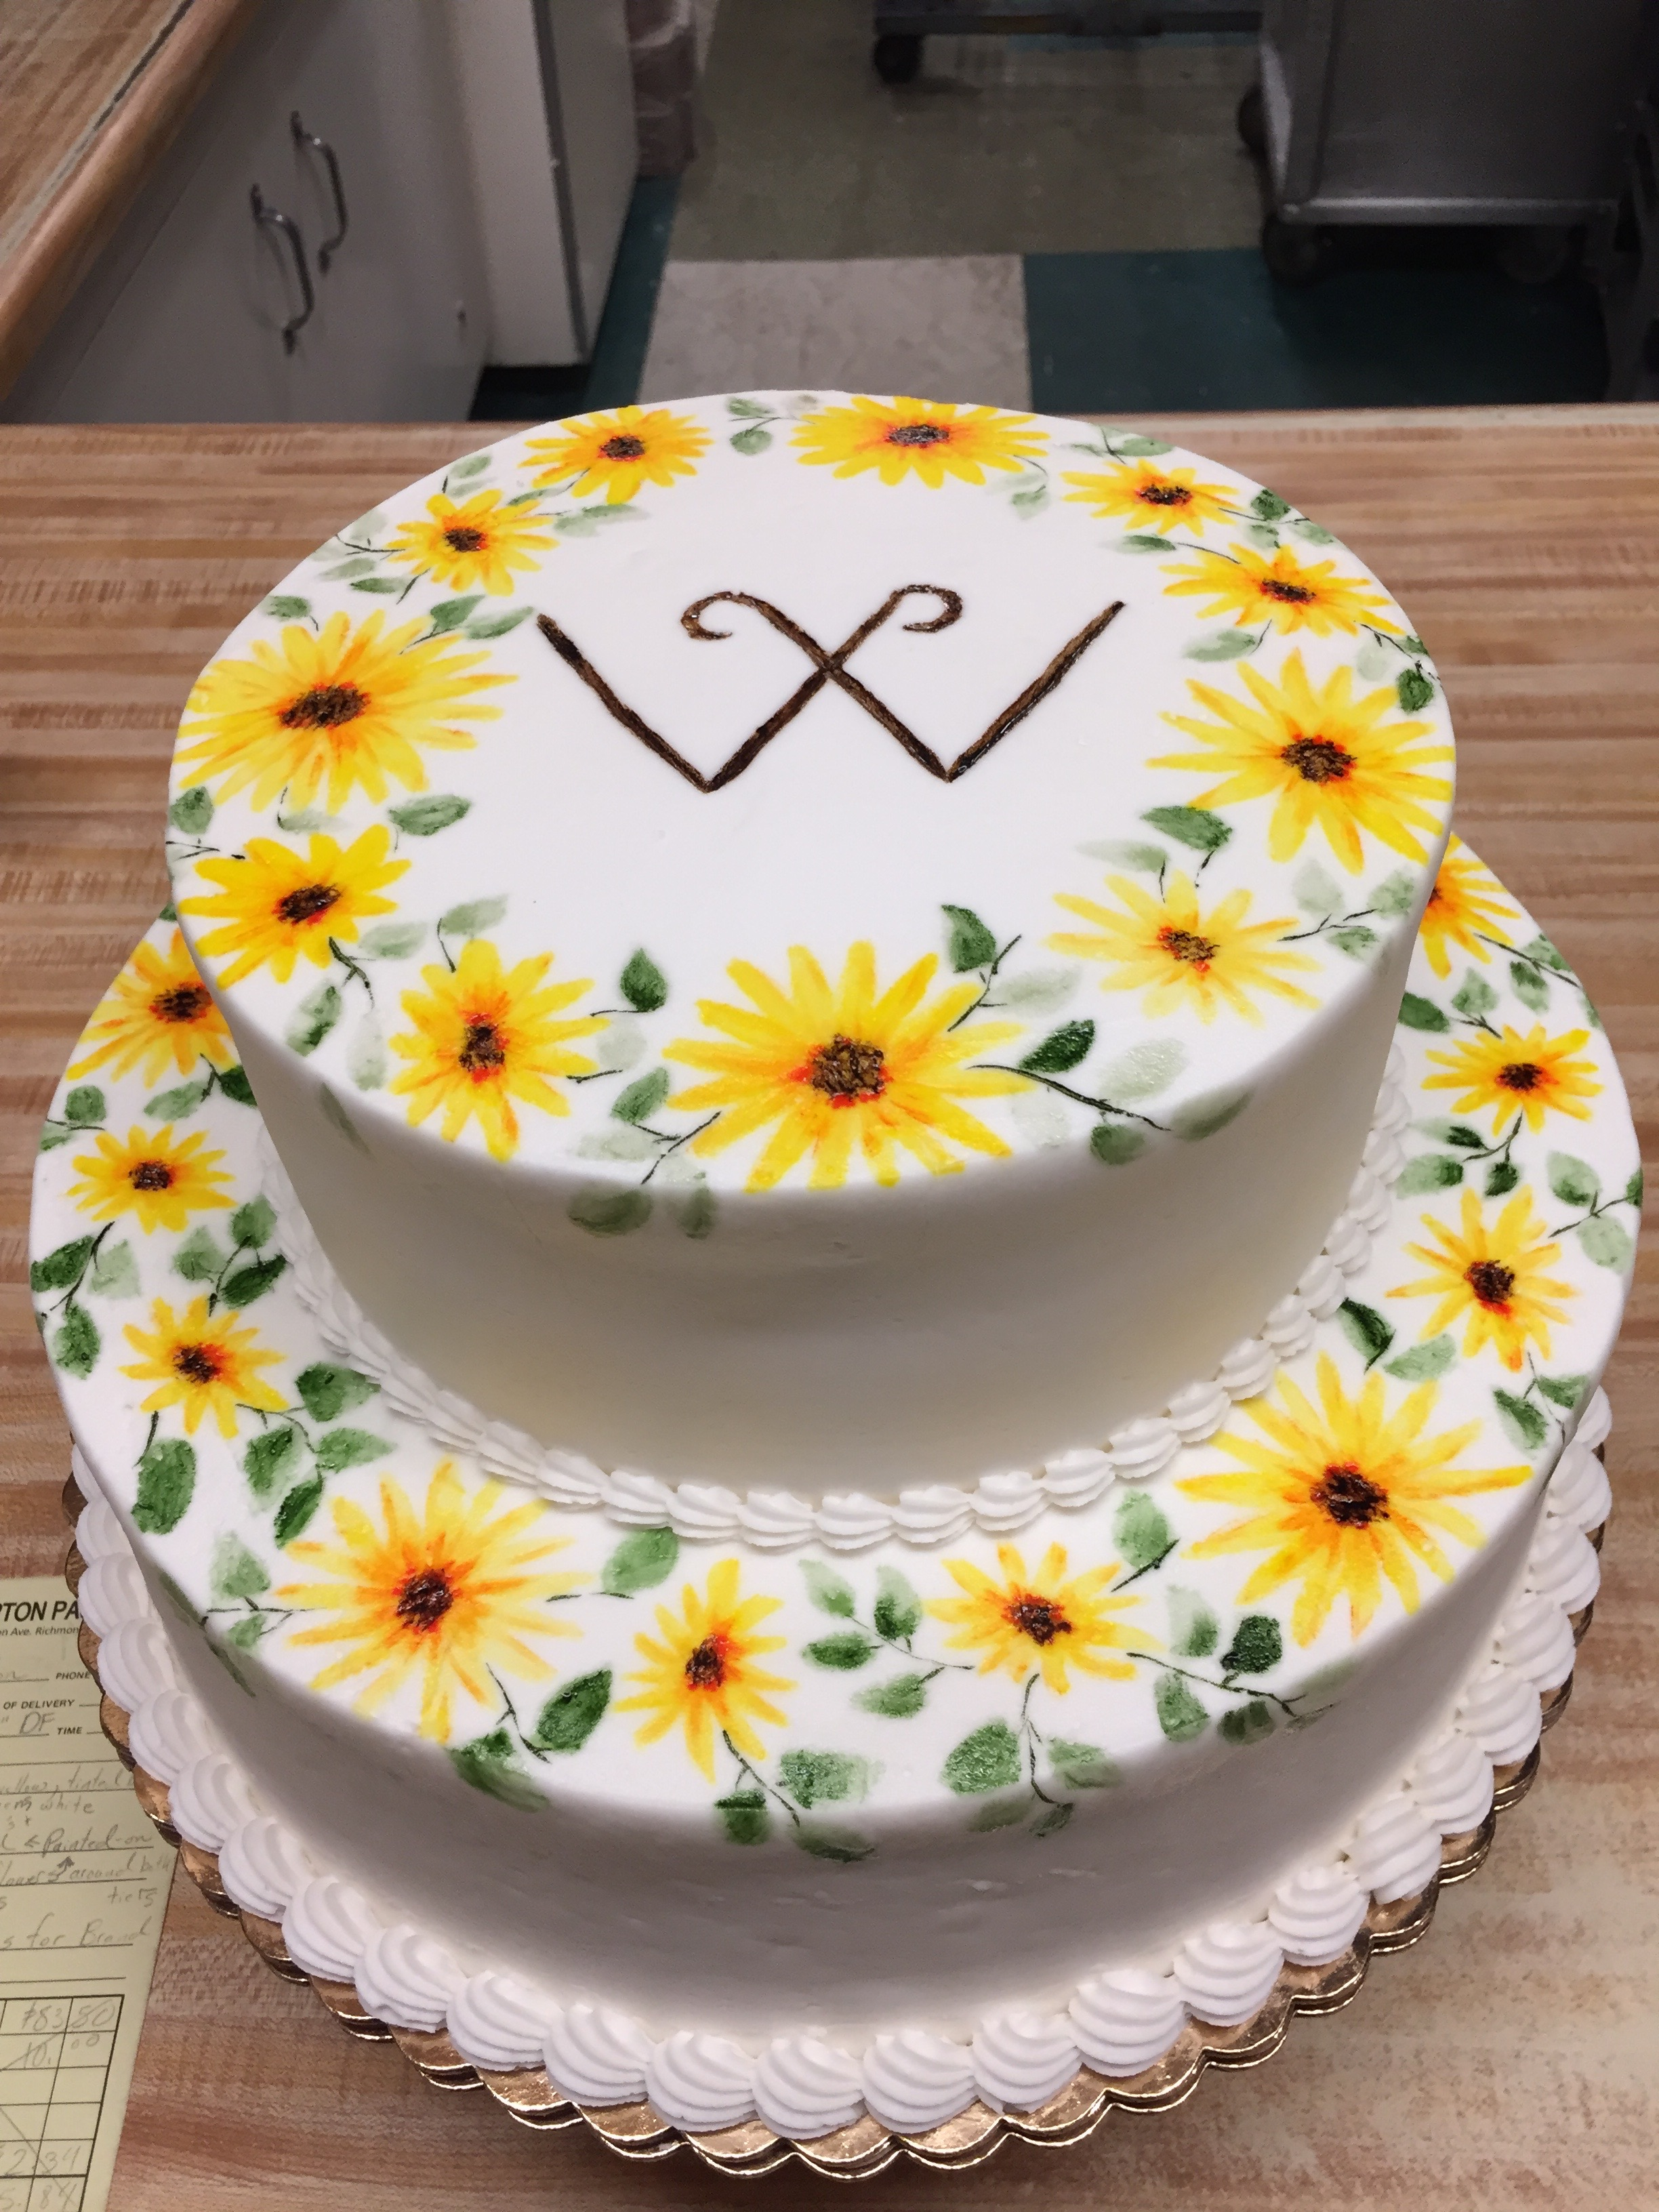 Painted Sunflower Cake 12